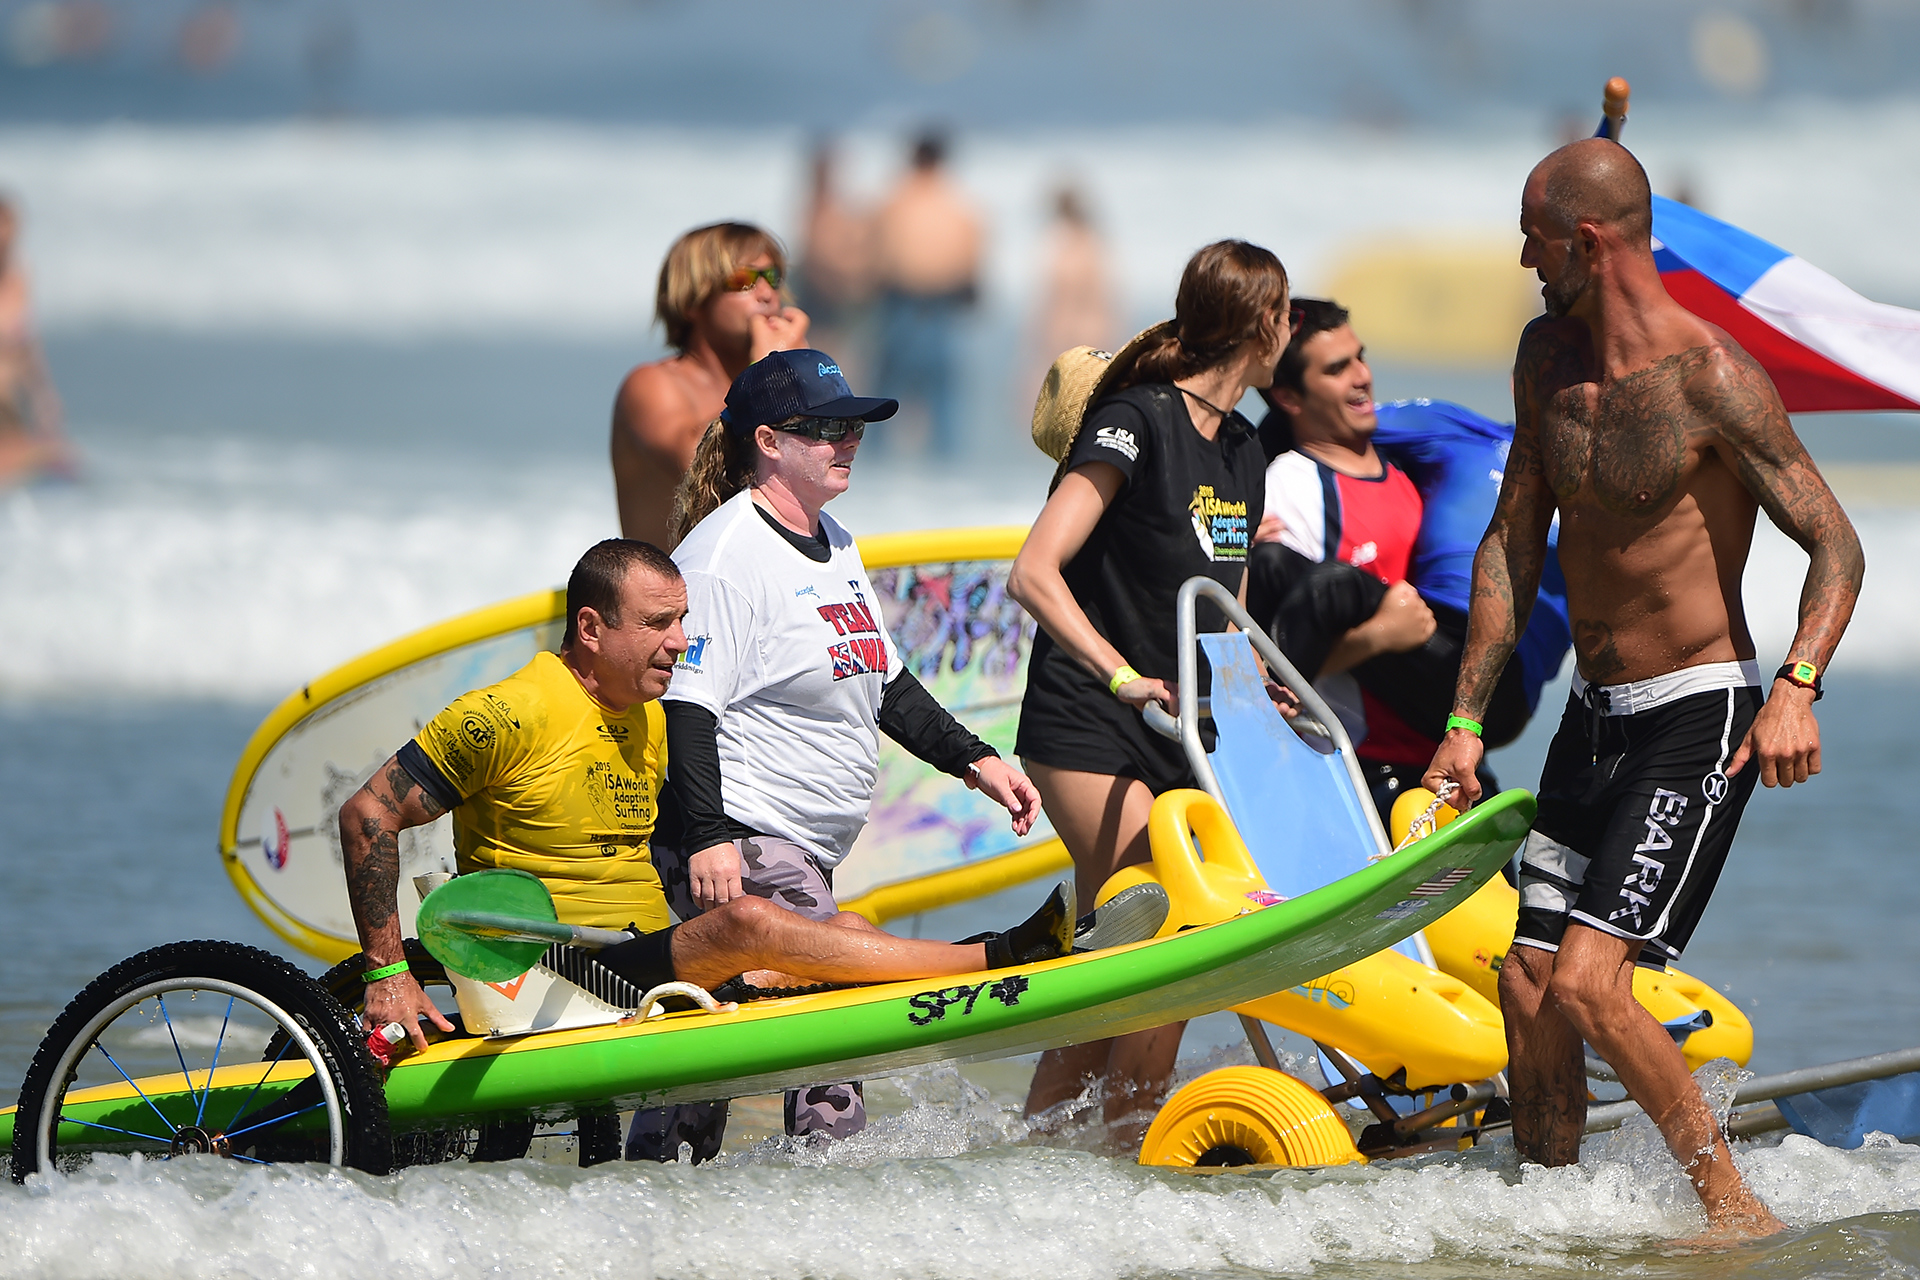 2015 ISA World Adaptive Surfing Championship